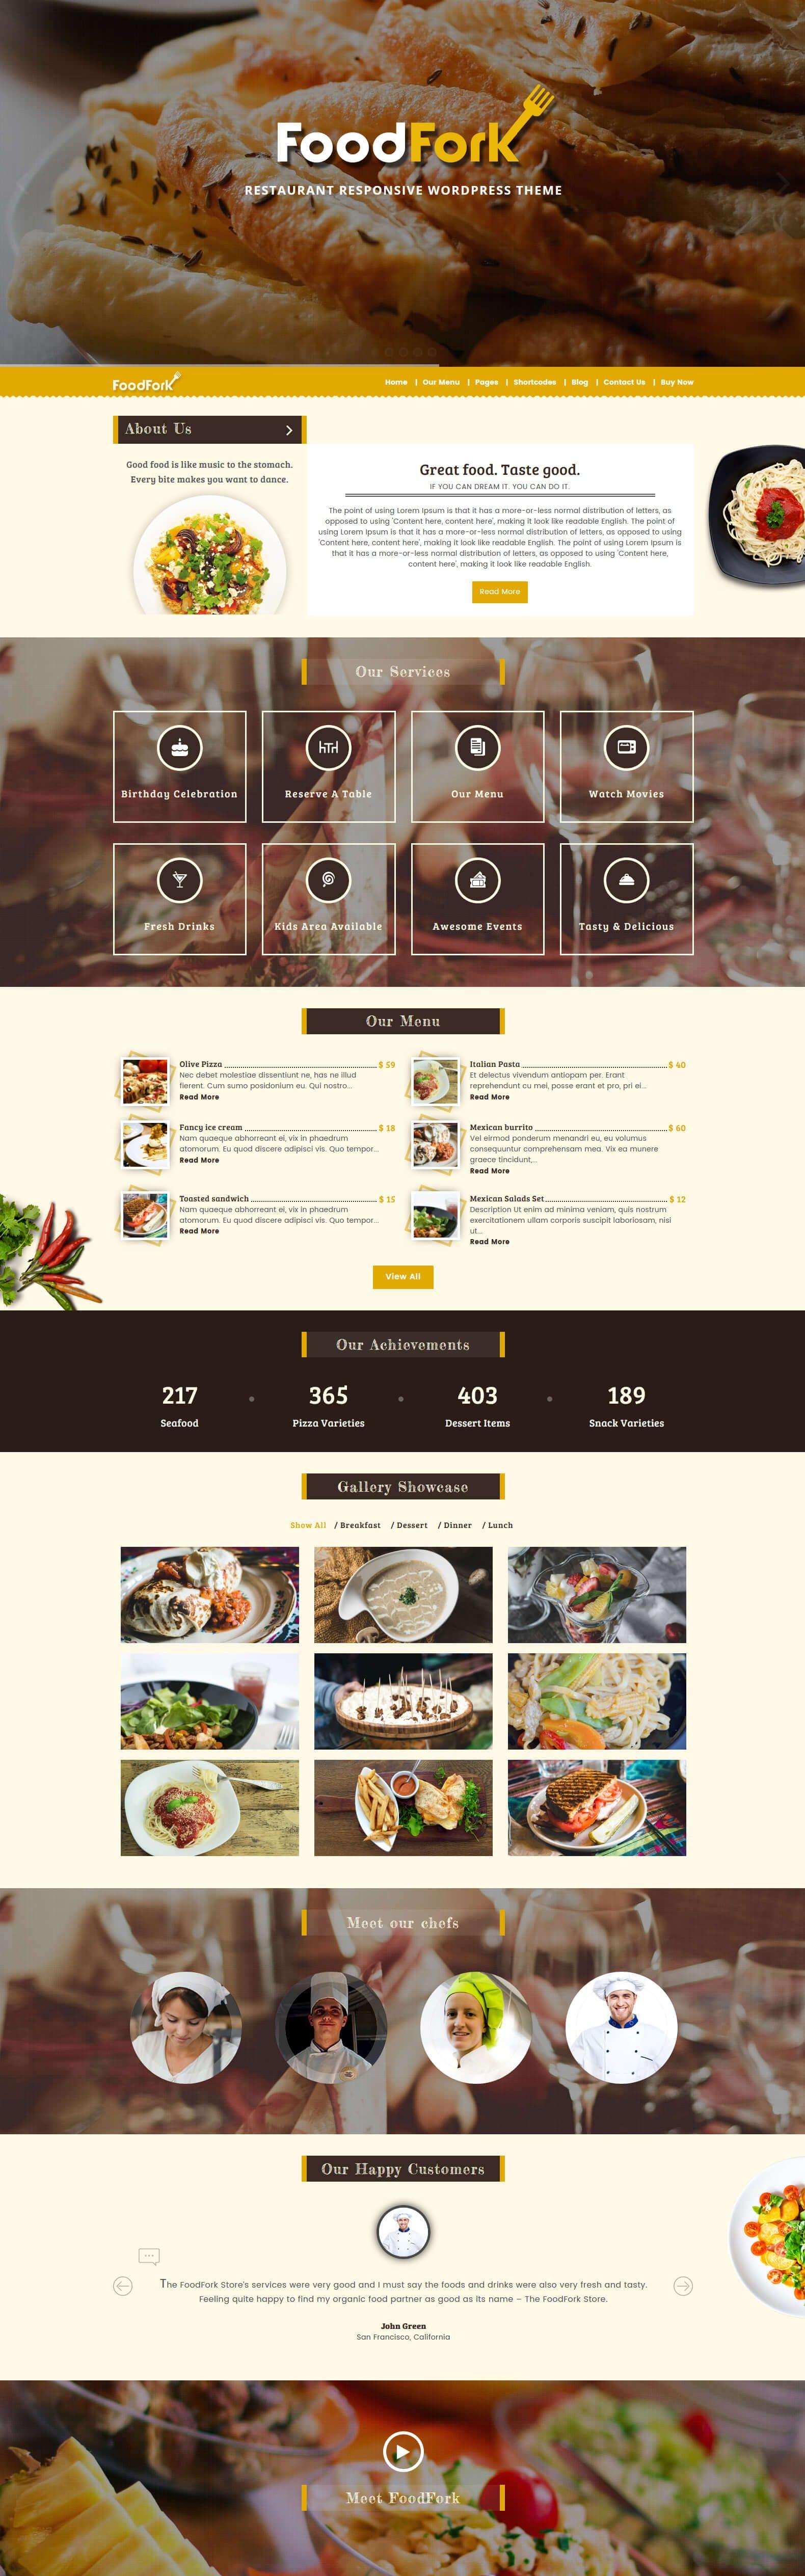 foodfork wordpress themes